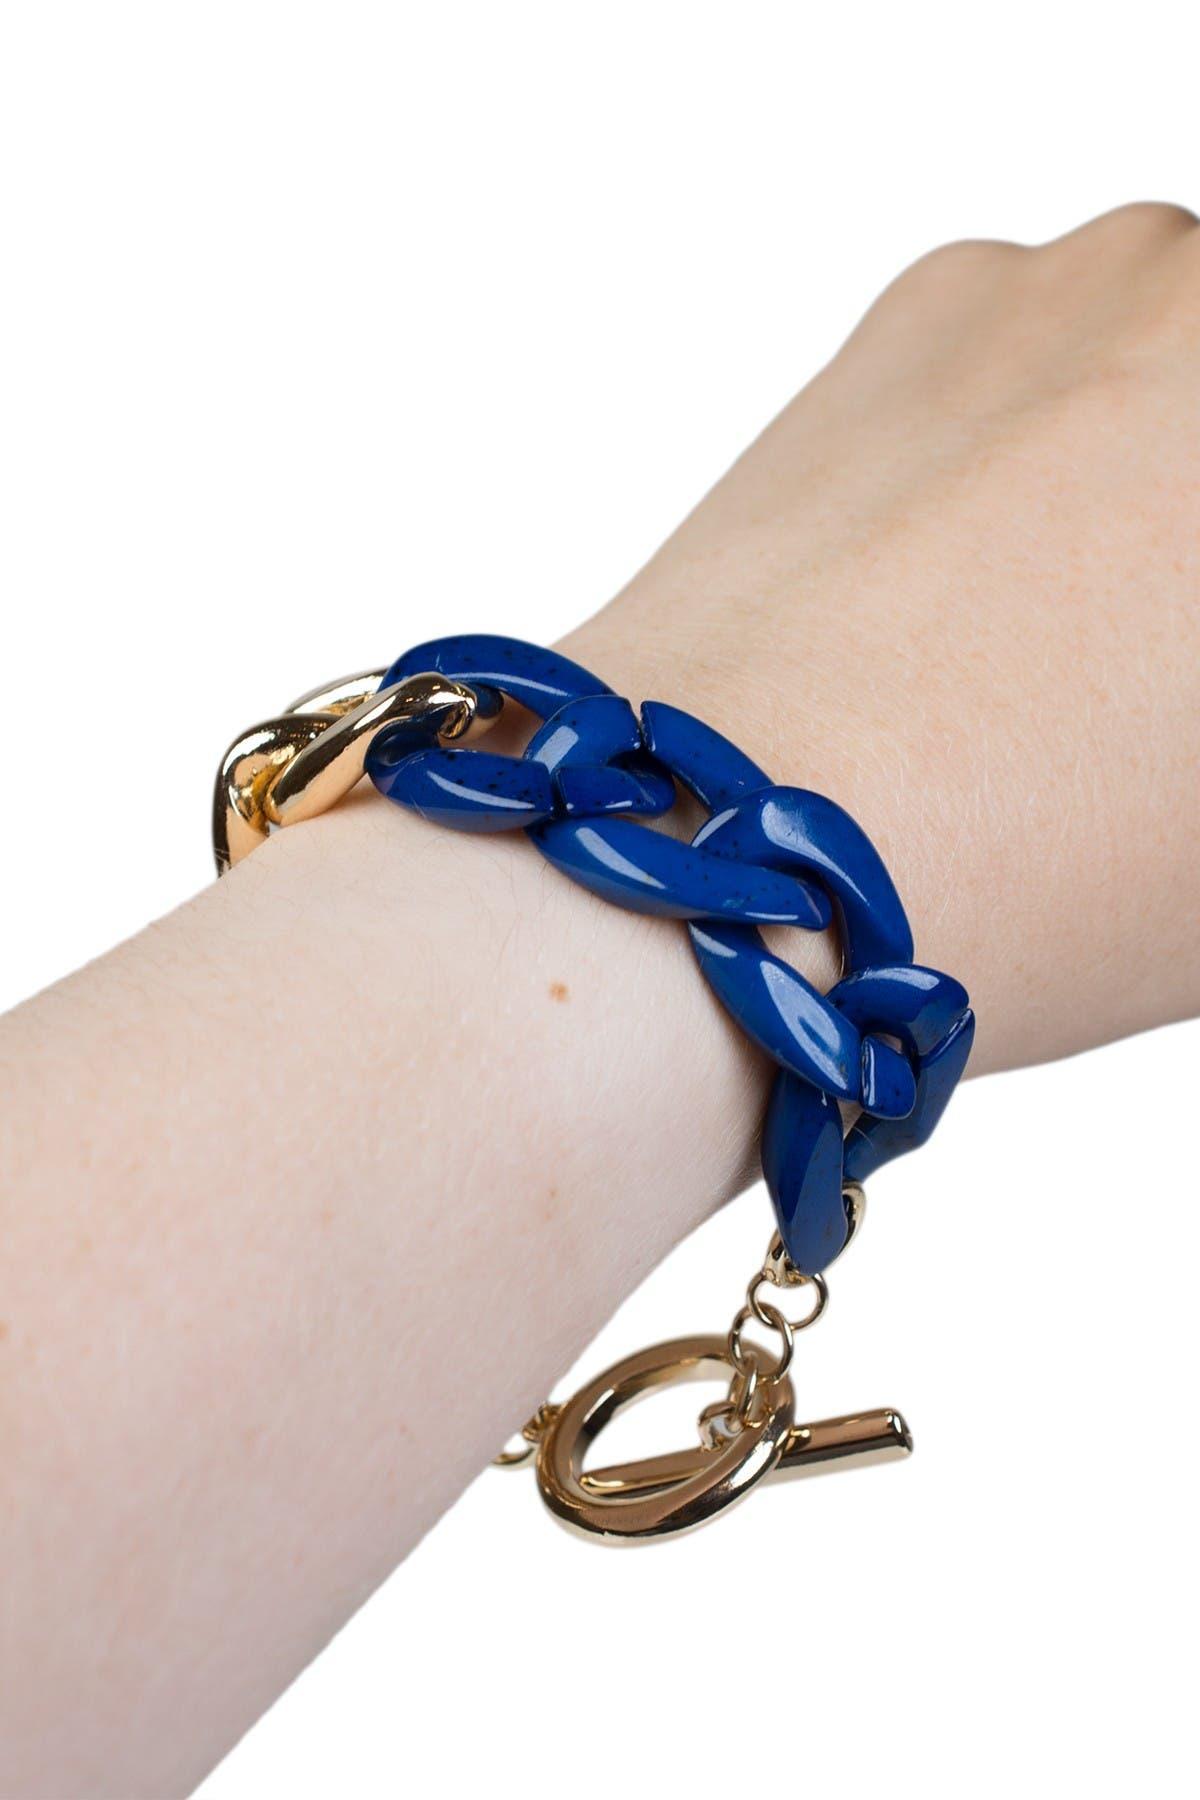 Image of Jardin Curb Chain & Acrylic Link Toggle Bracelet